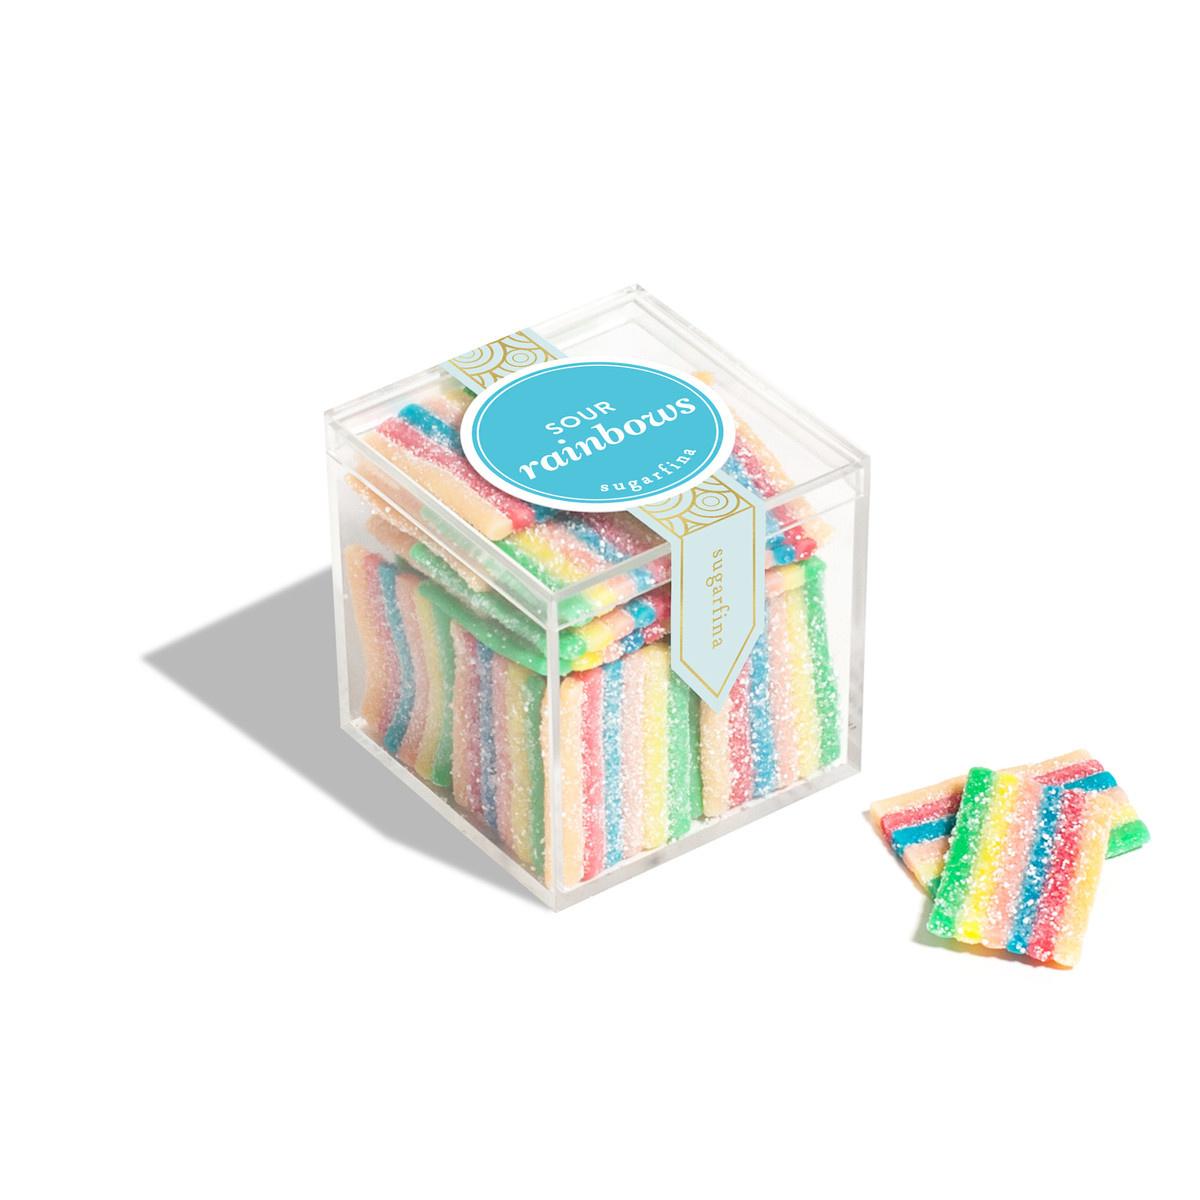 Sugarfina Sour Rainbow Gummies